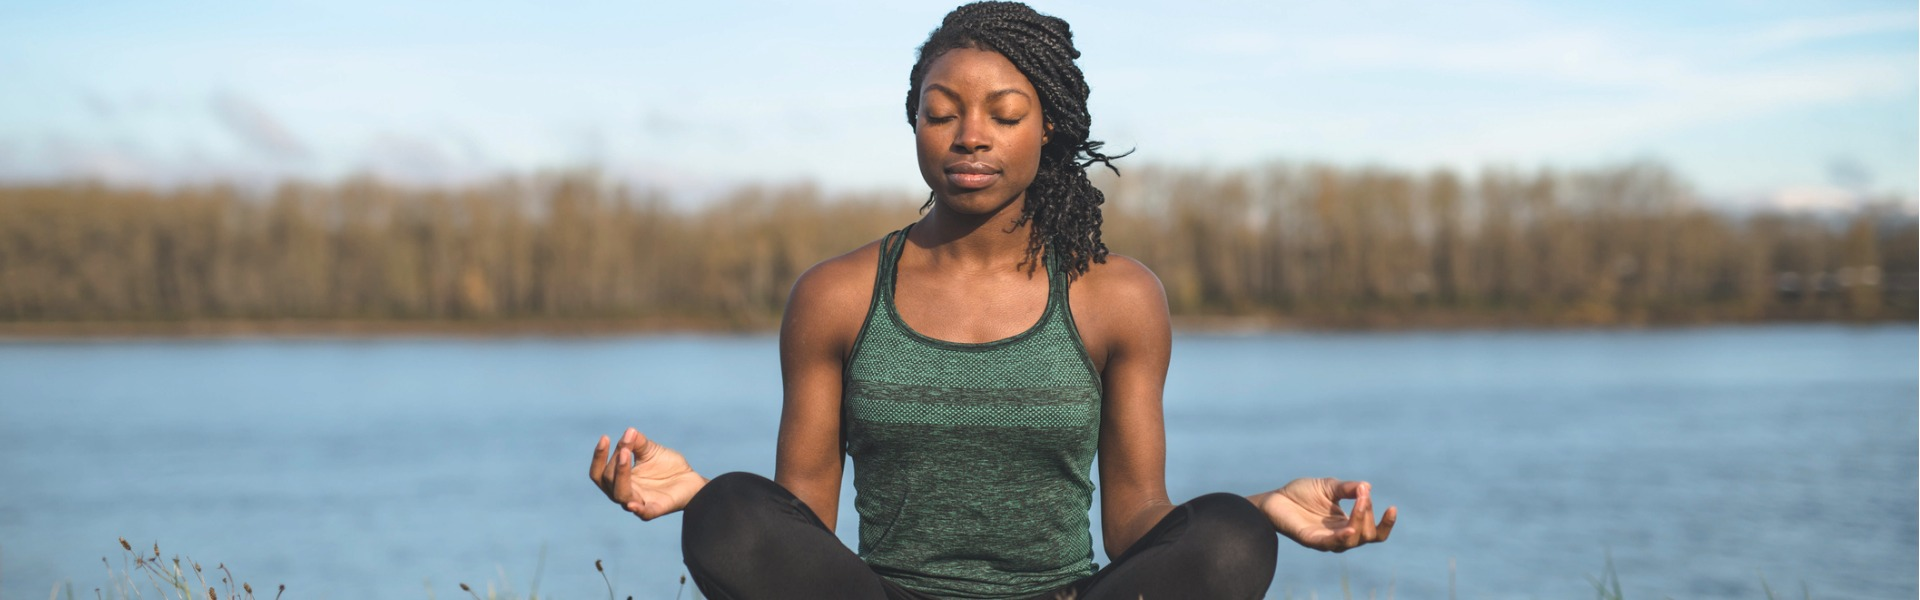 health benefits of meditation and mindfulness